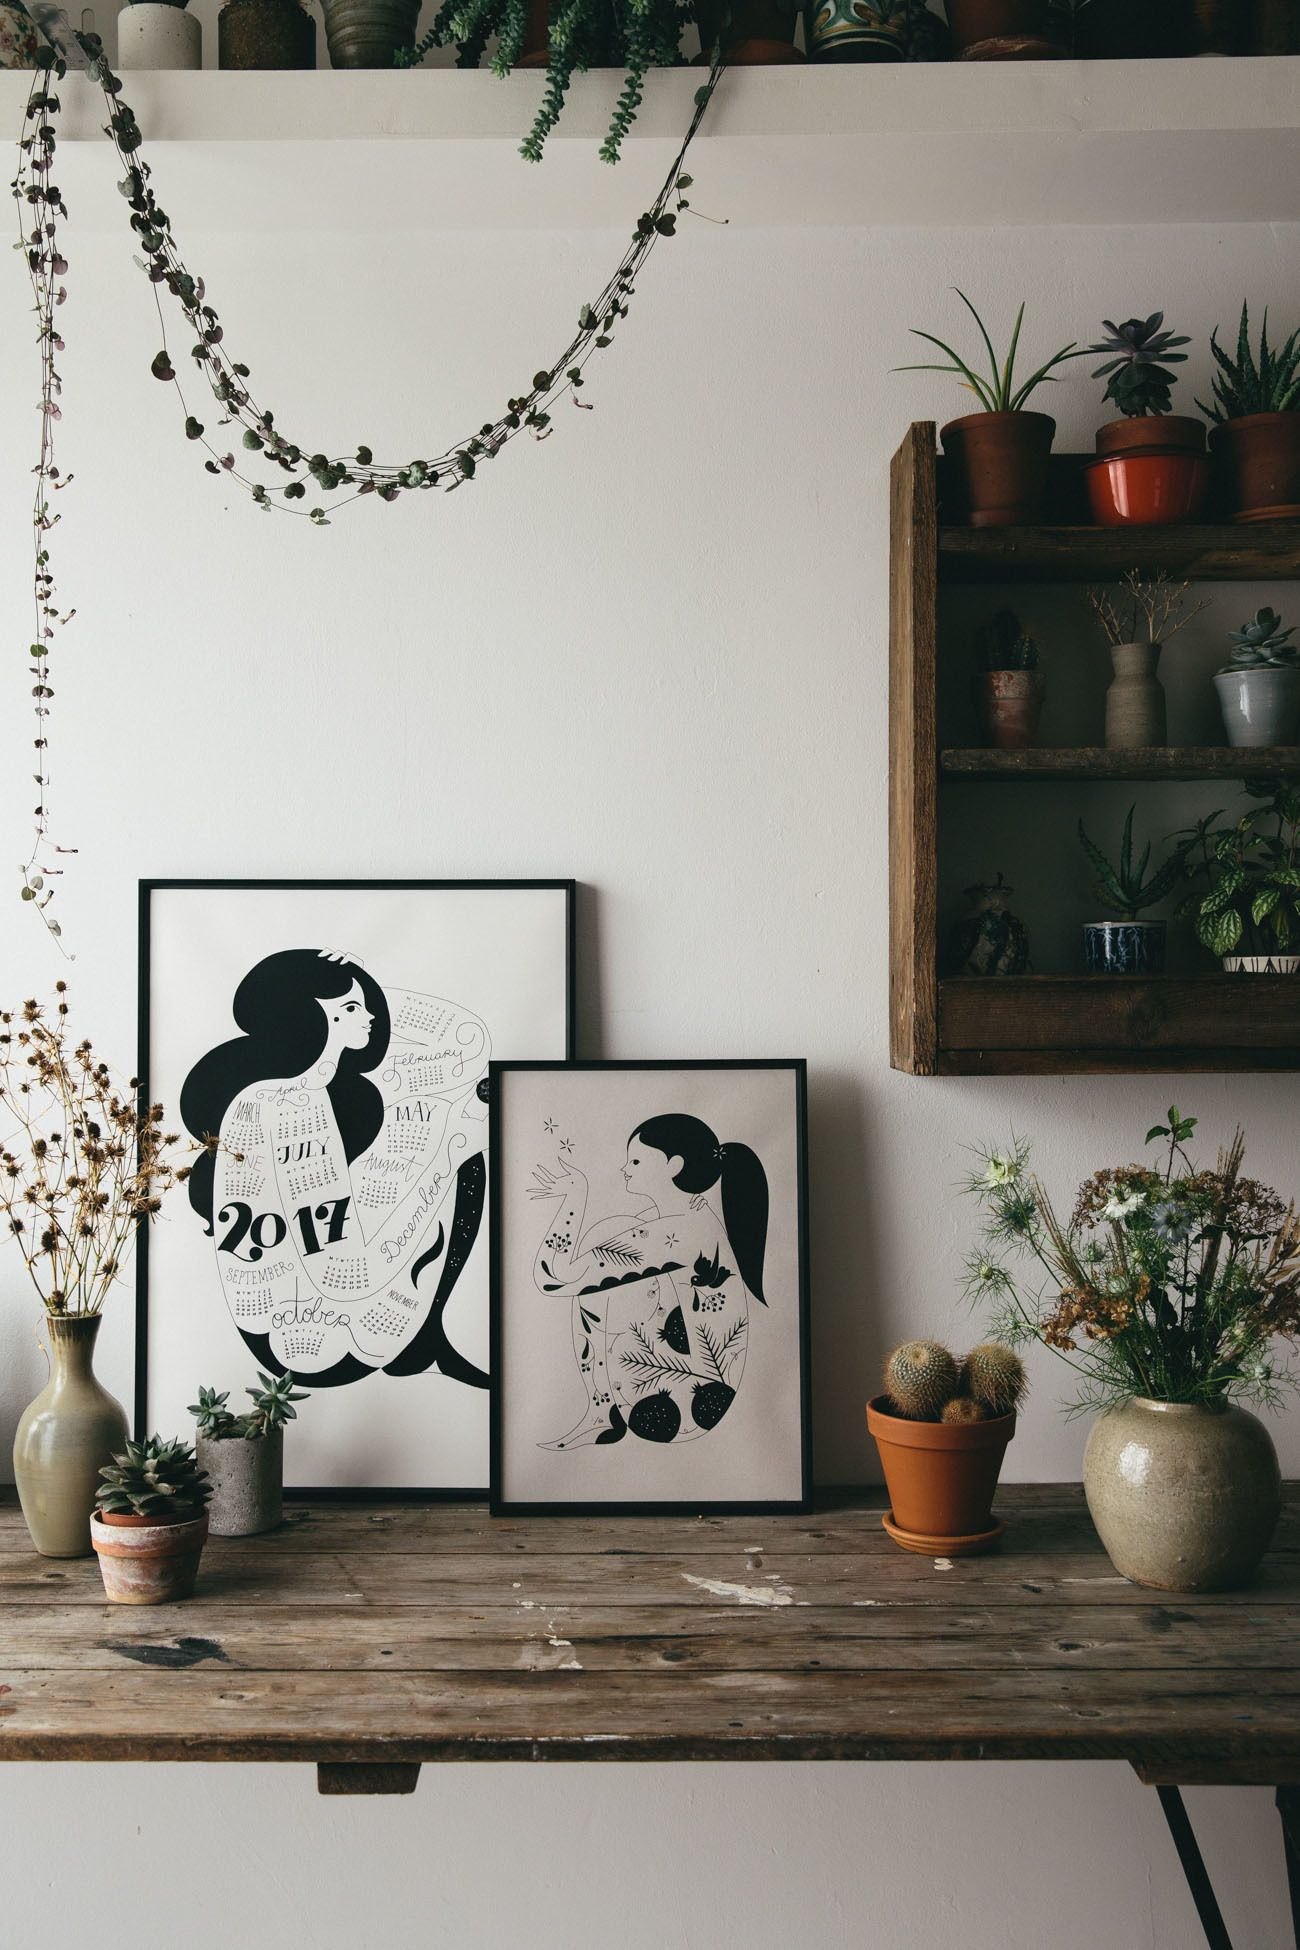 2017 Tattoo lady illustrated poster calendar